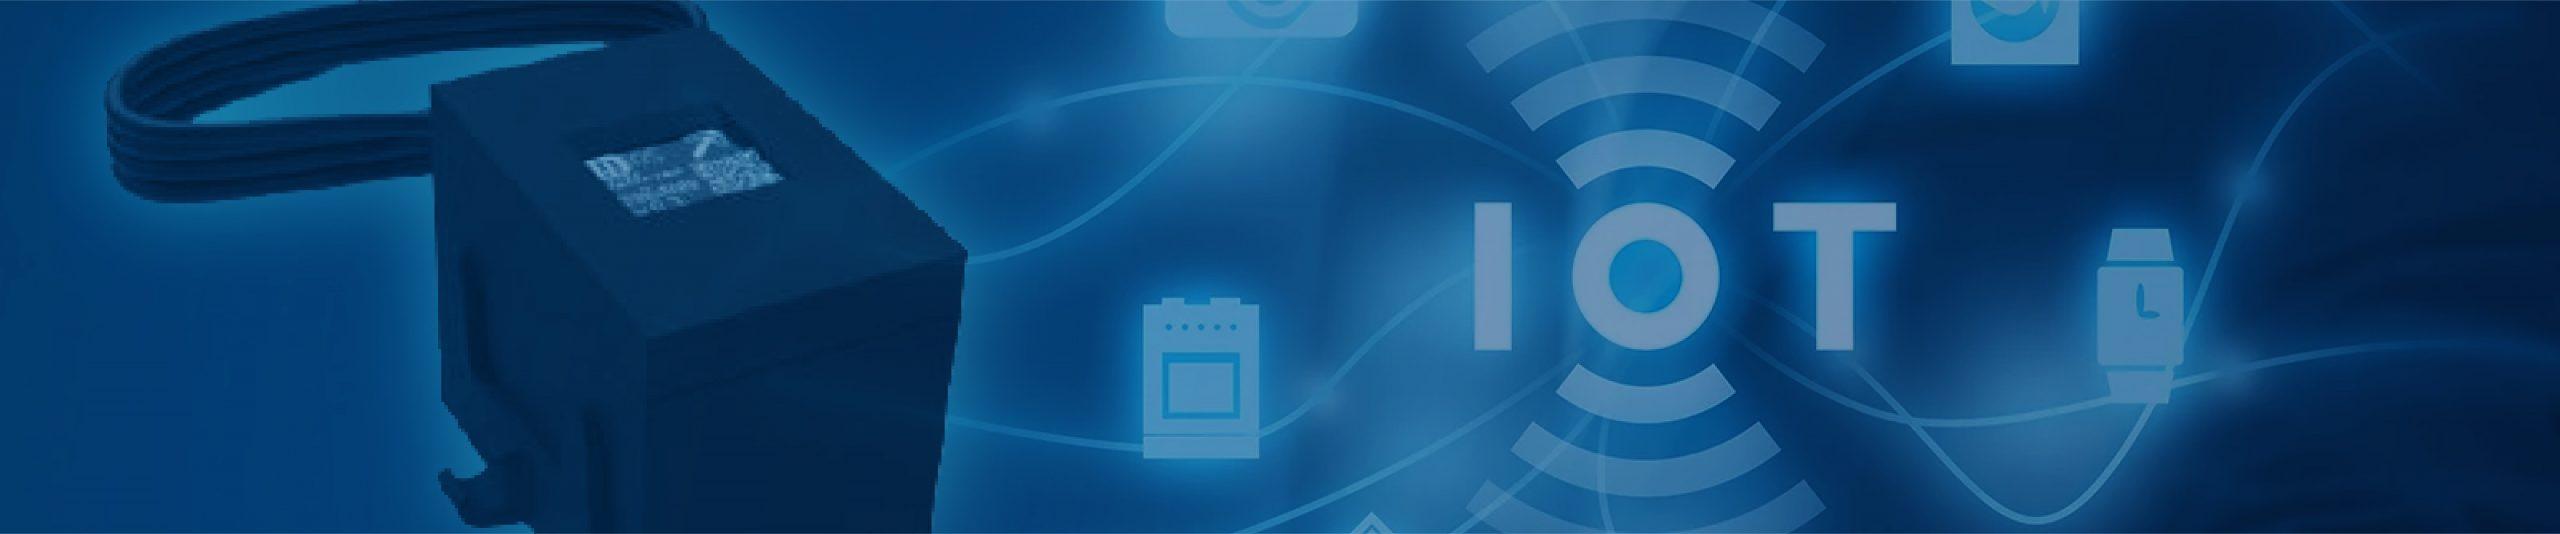 BLOQNET (IoT) Header image